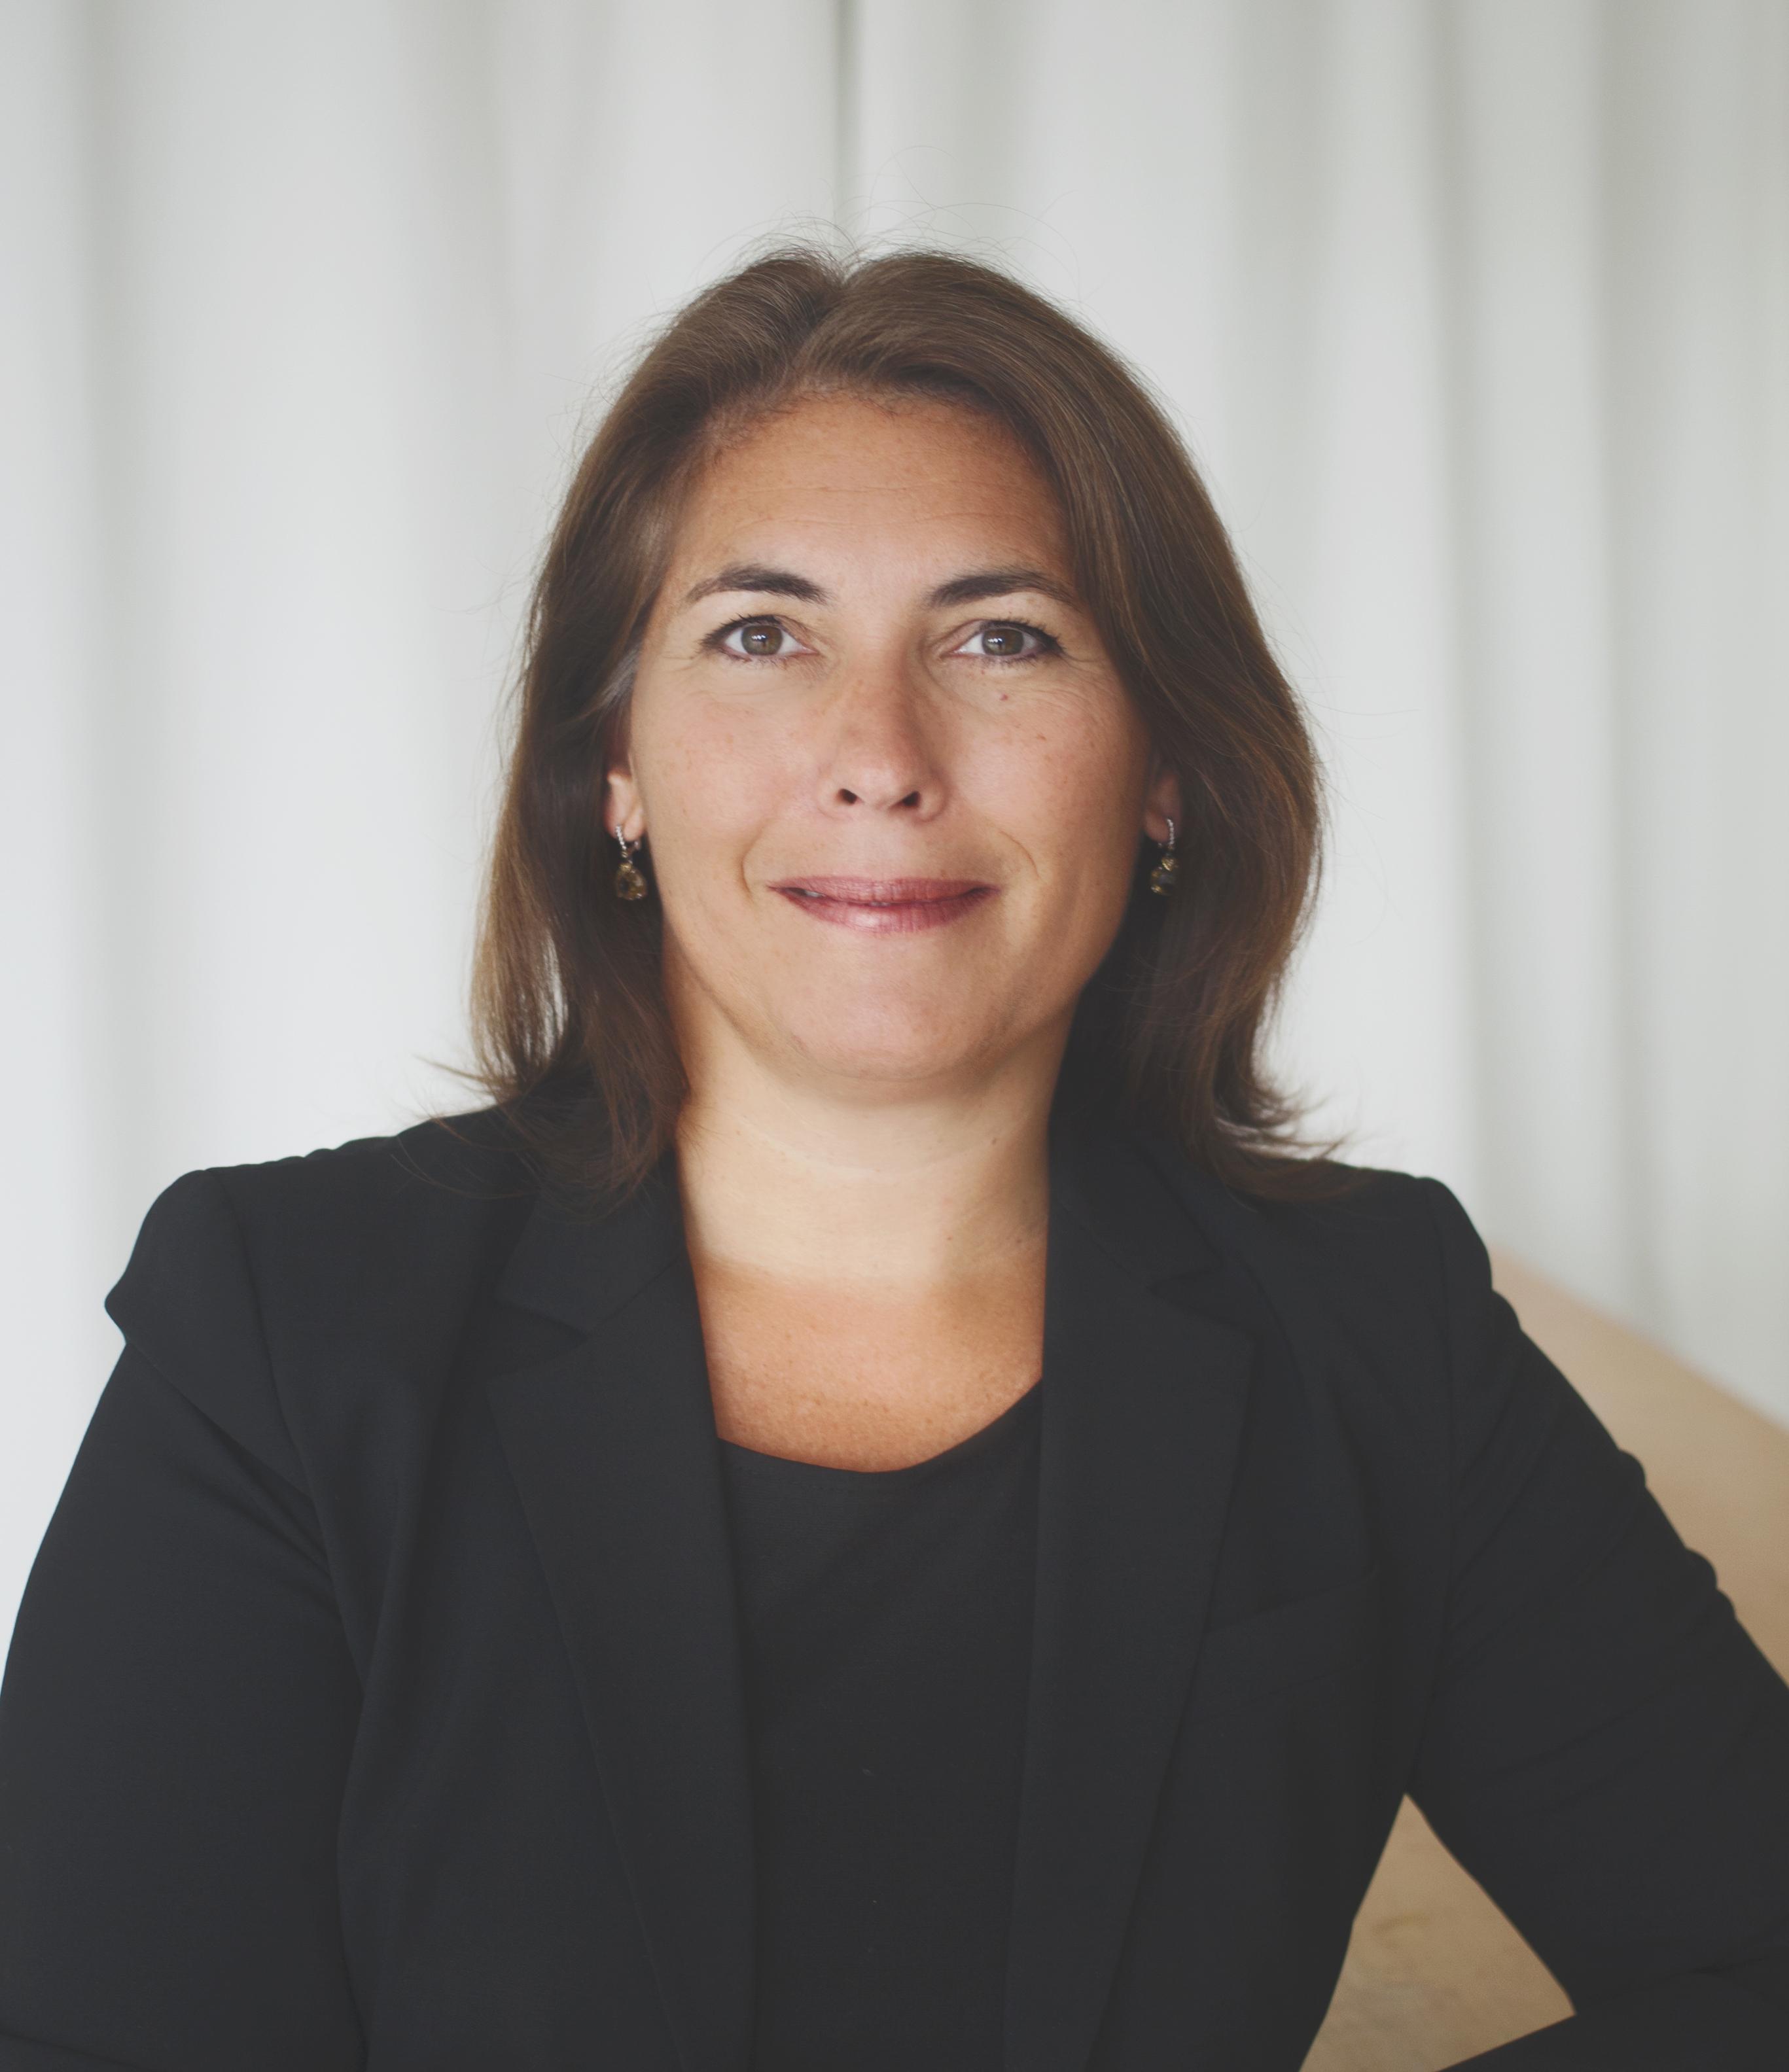 Anie Rouleau, BCom 1992